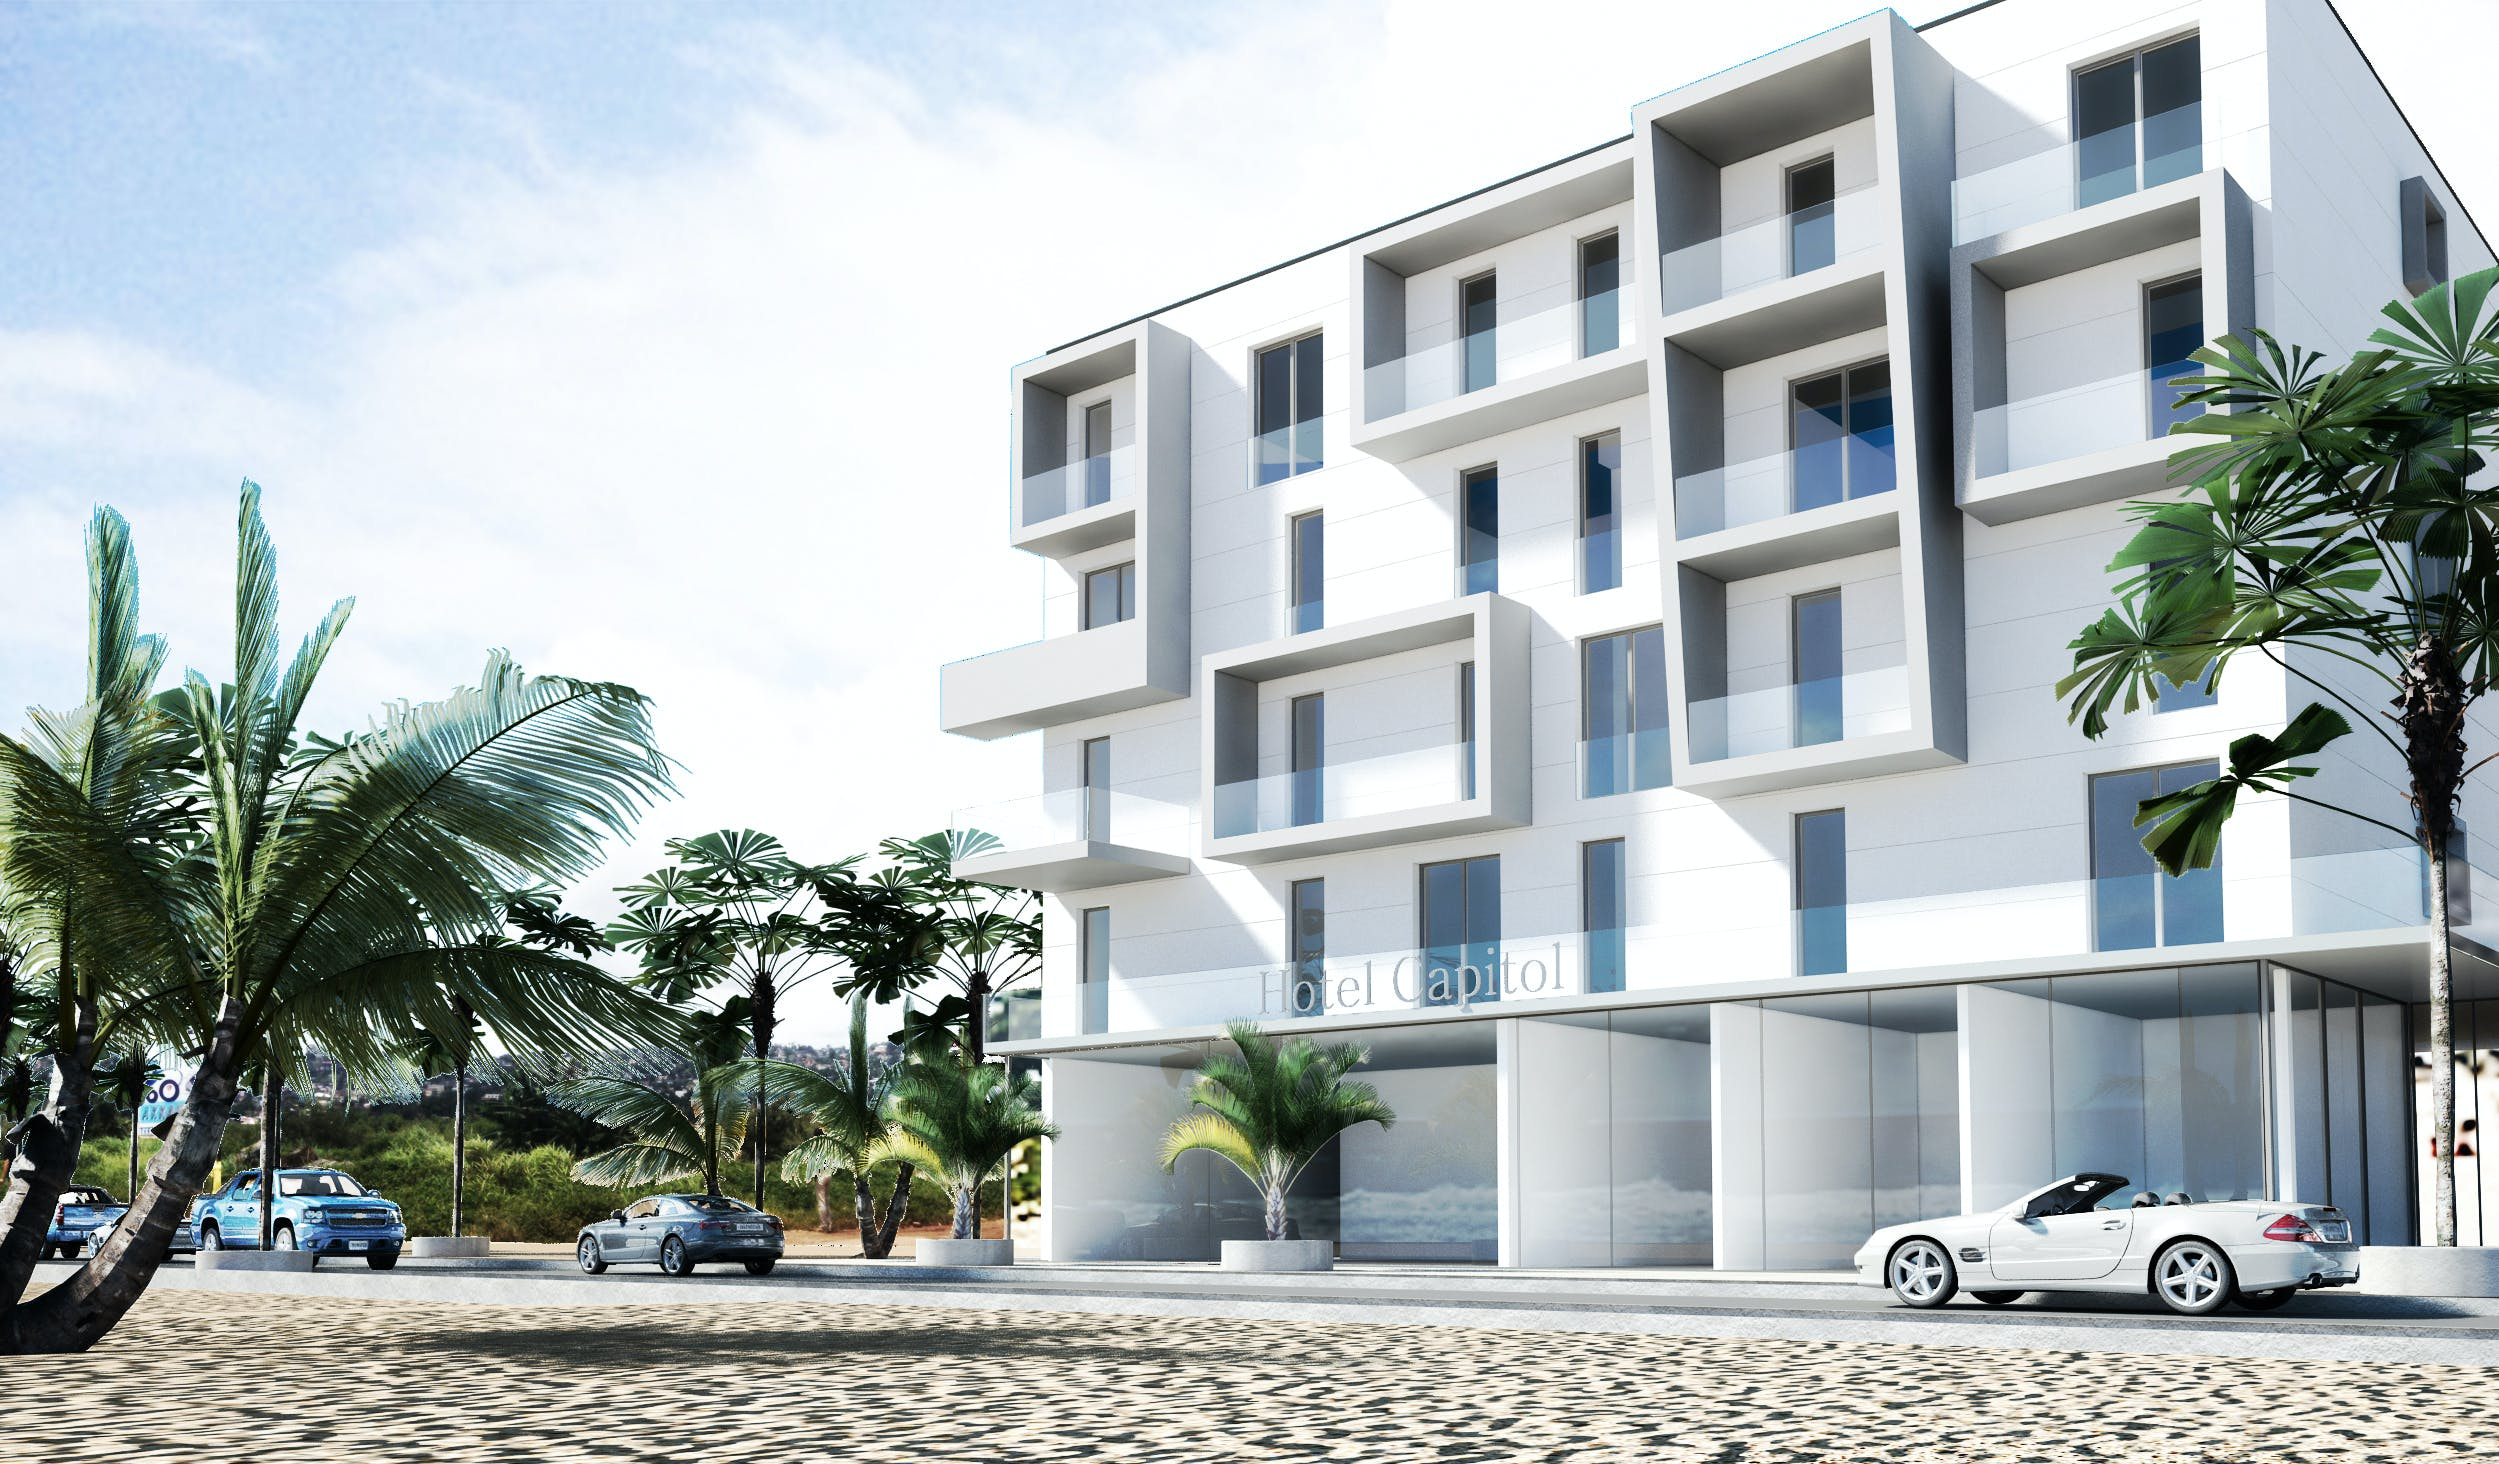 Prefab Hotel Sierra Leone Margherita Cesca Archinect